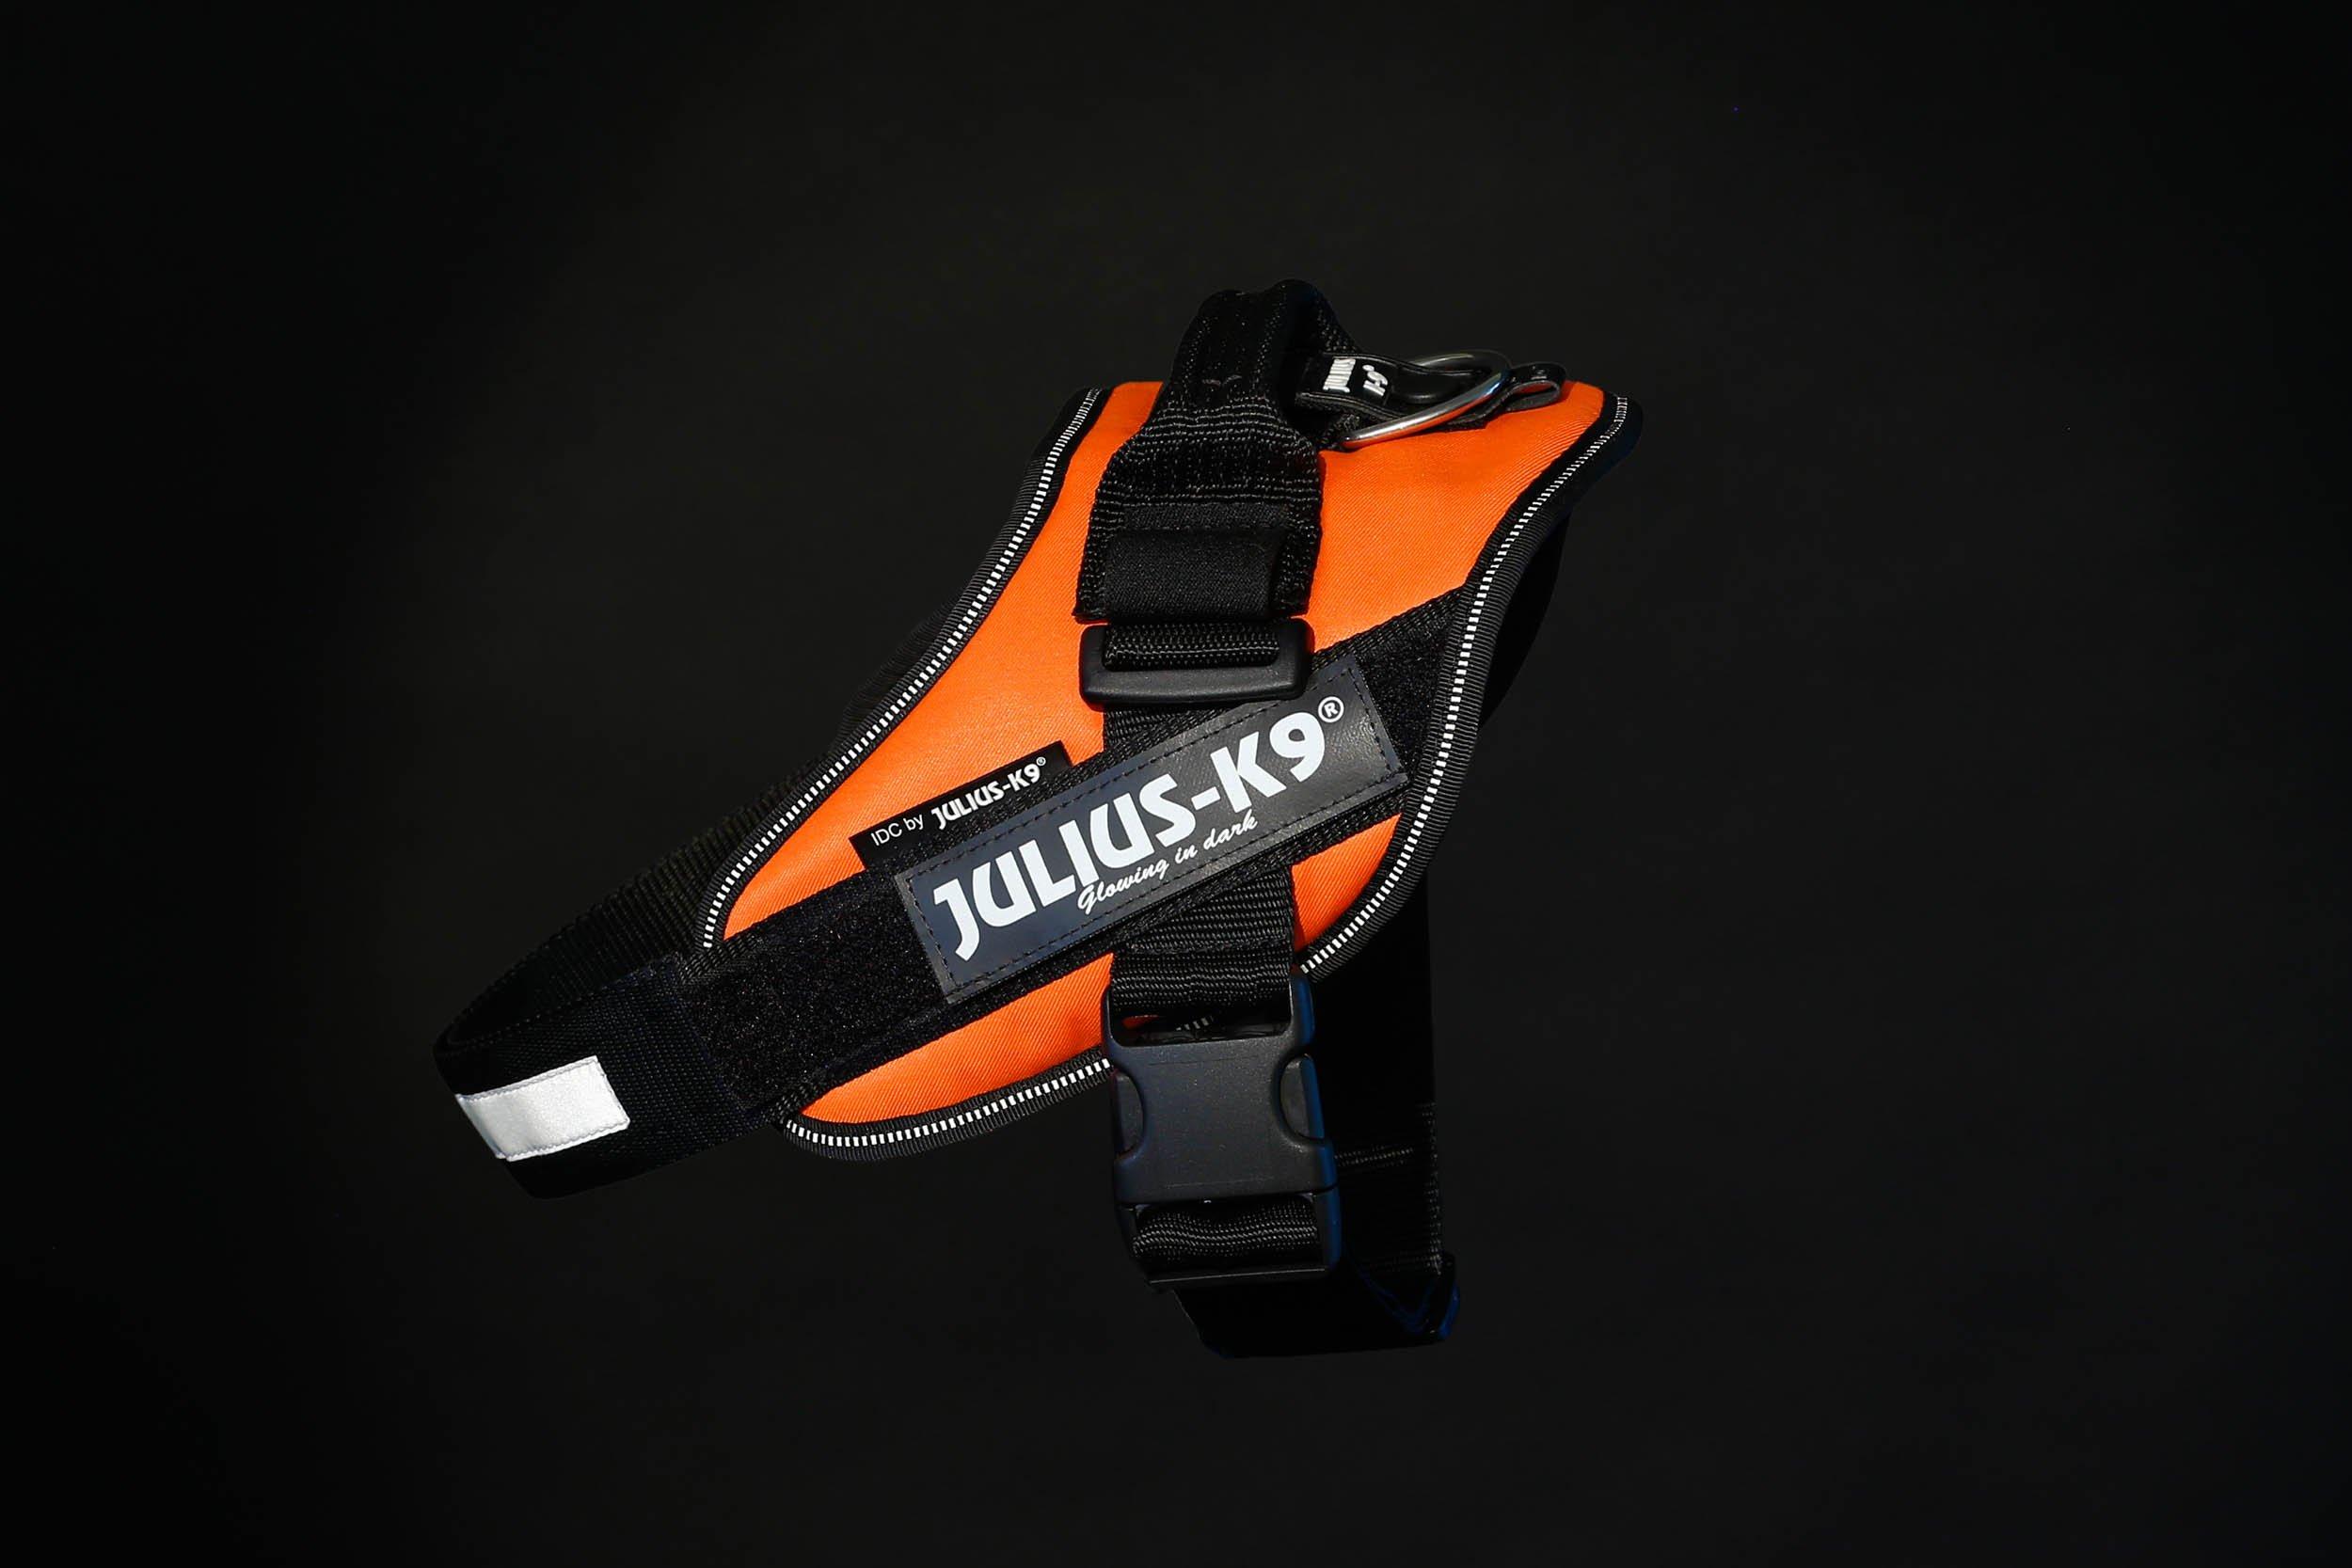 Julius-K9 16IDC-for-0 IDC Power Harness, Size: 0 (58-76cm/23-30), UV Orange